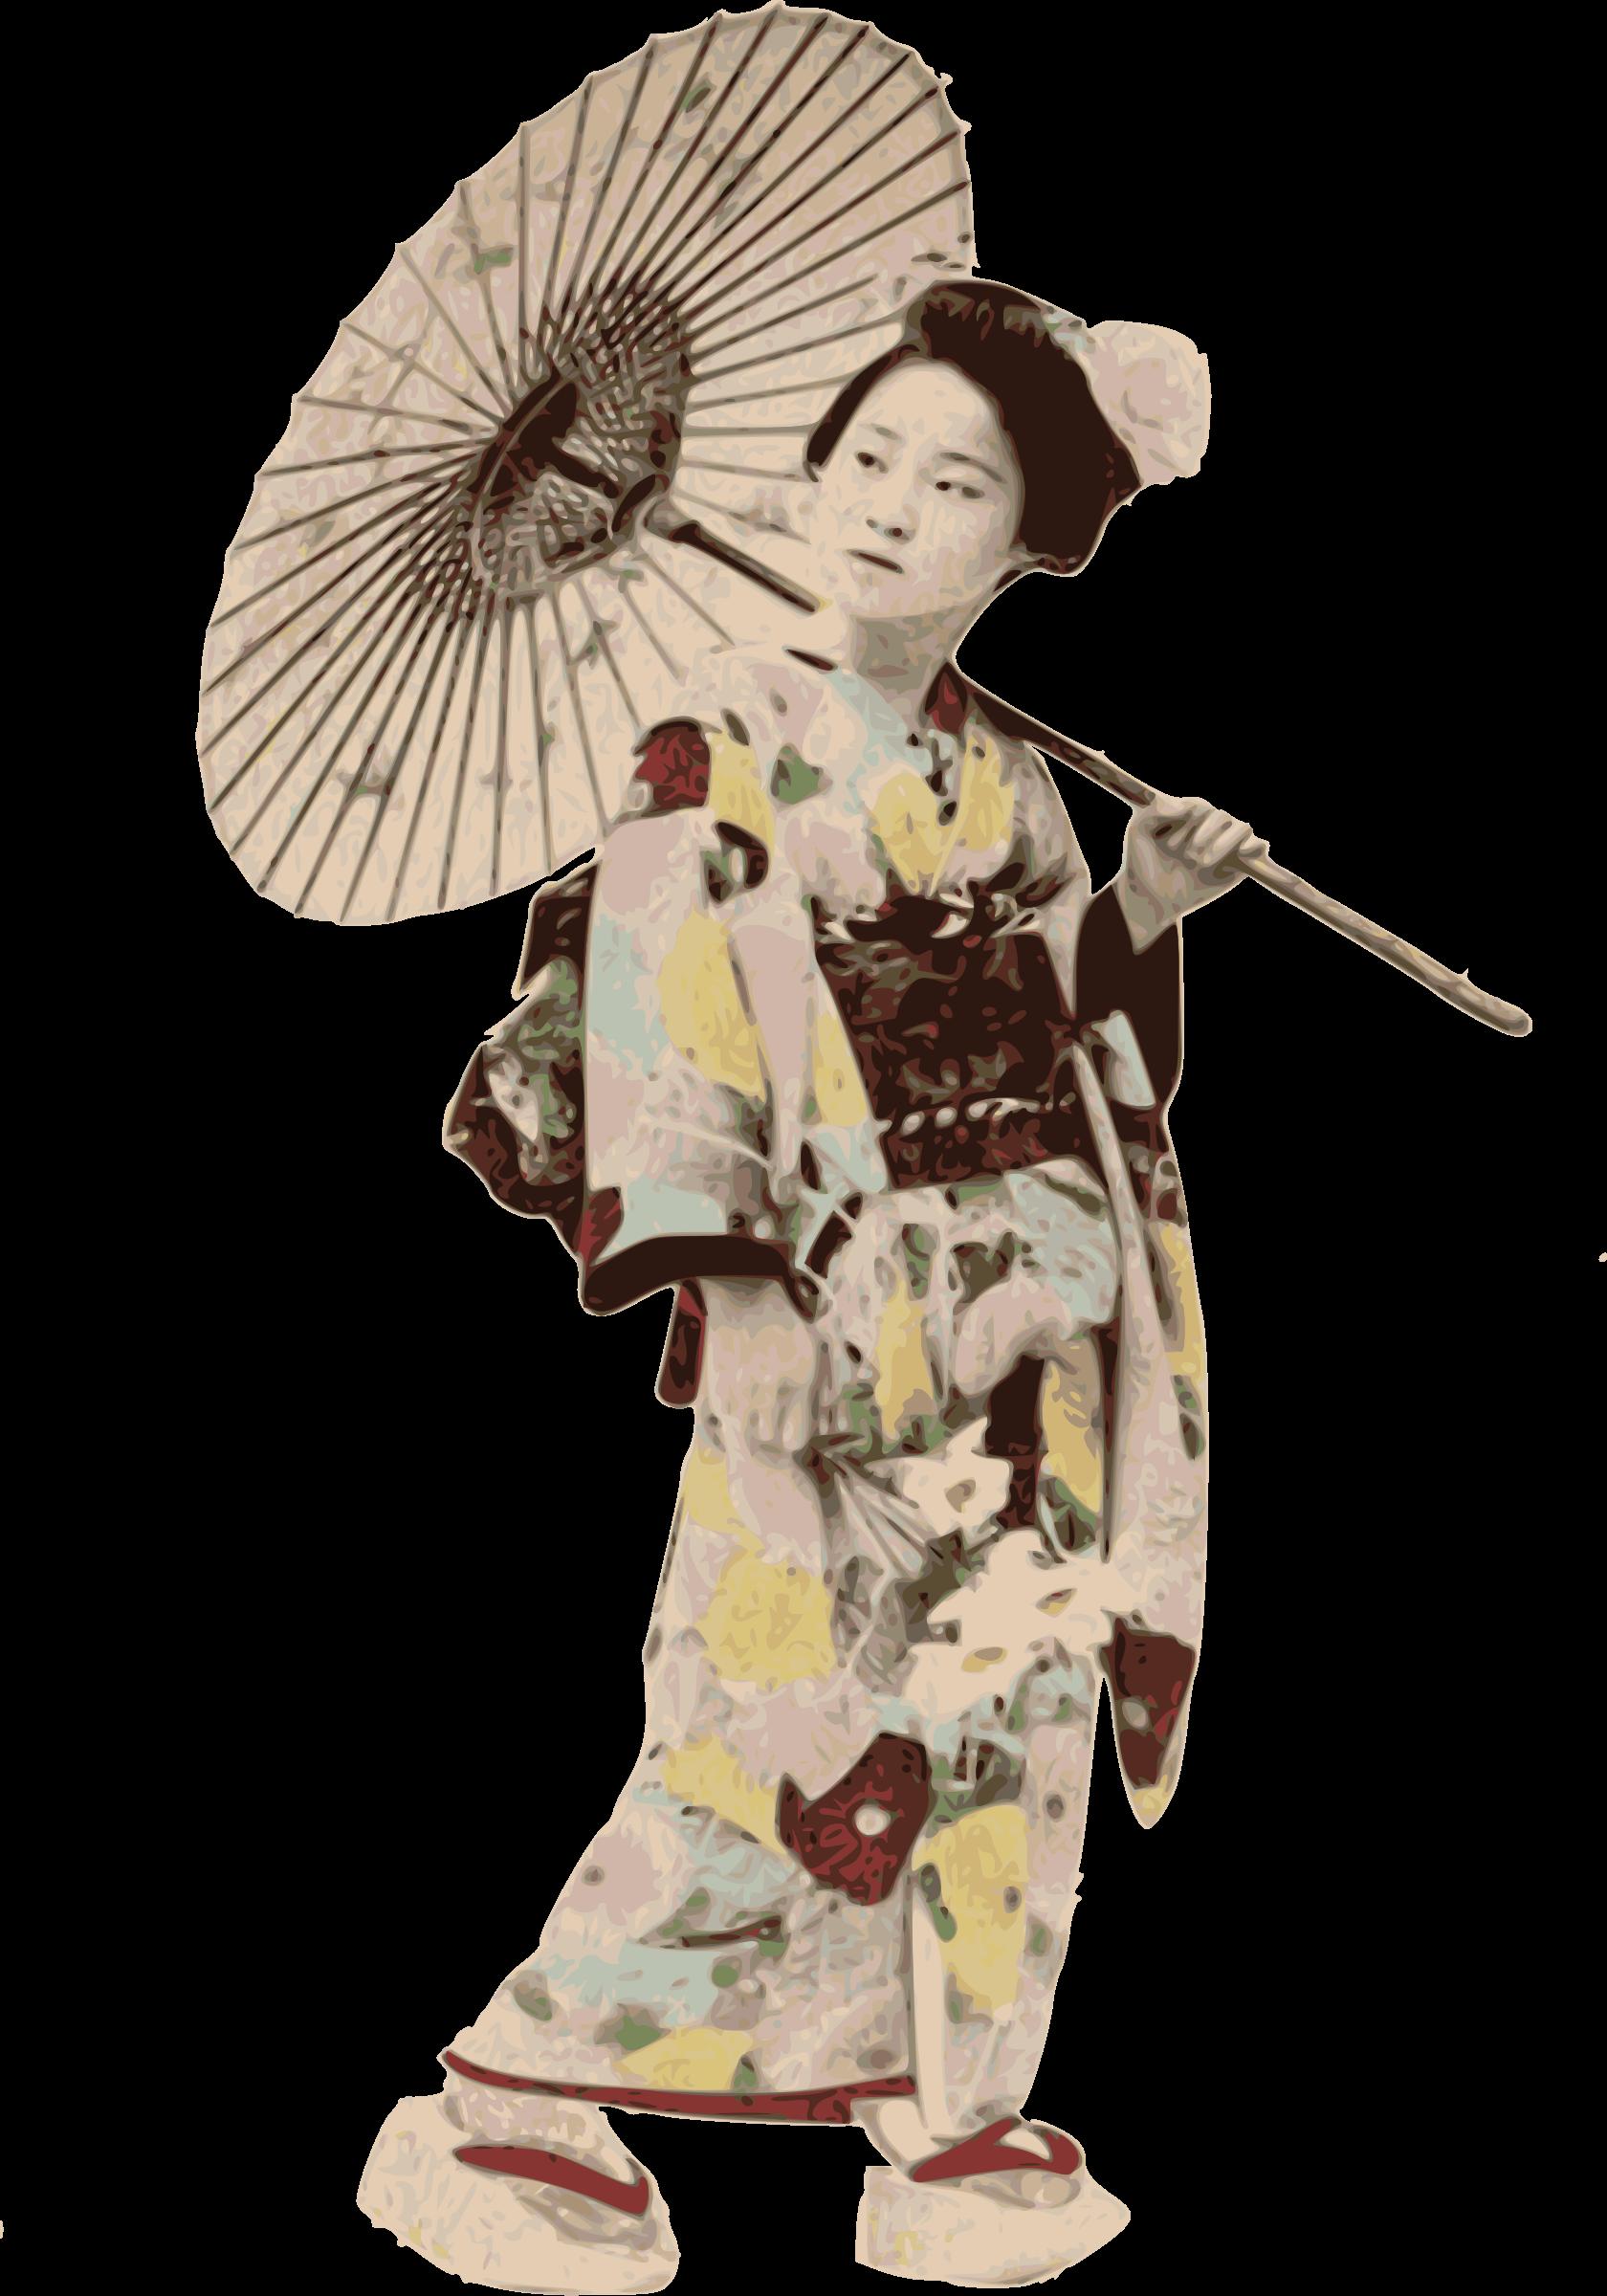 History clipart woman. Stereotypical kimono lady big